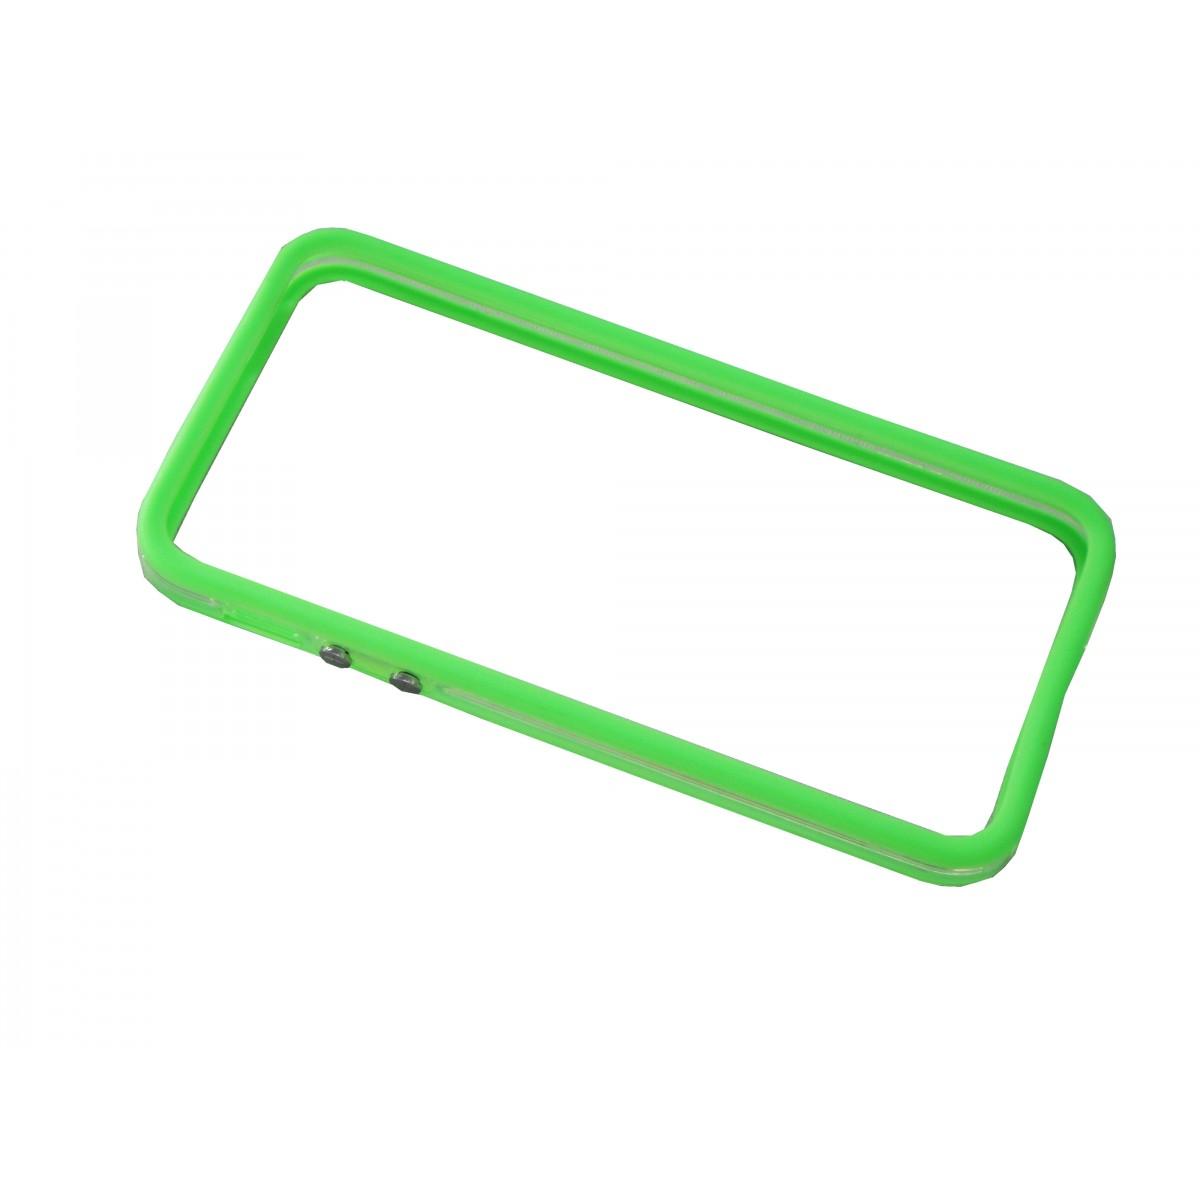 Capa Bumper Iphone 5 5G 5S  Pelicula Verde